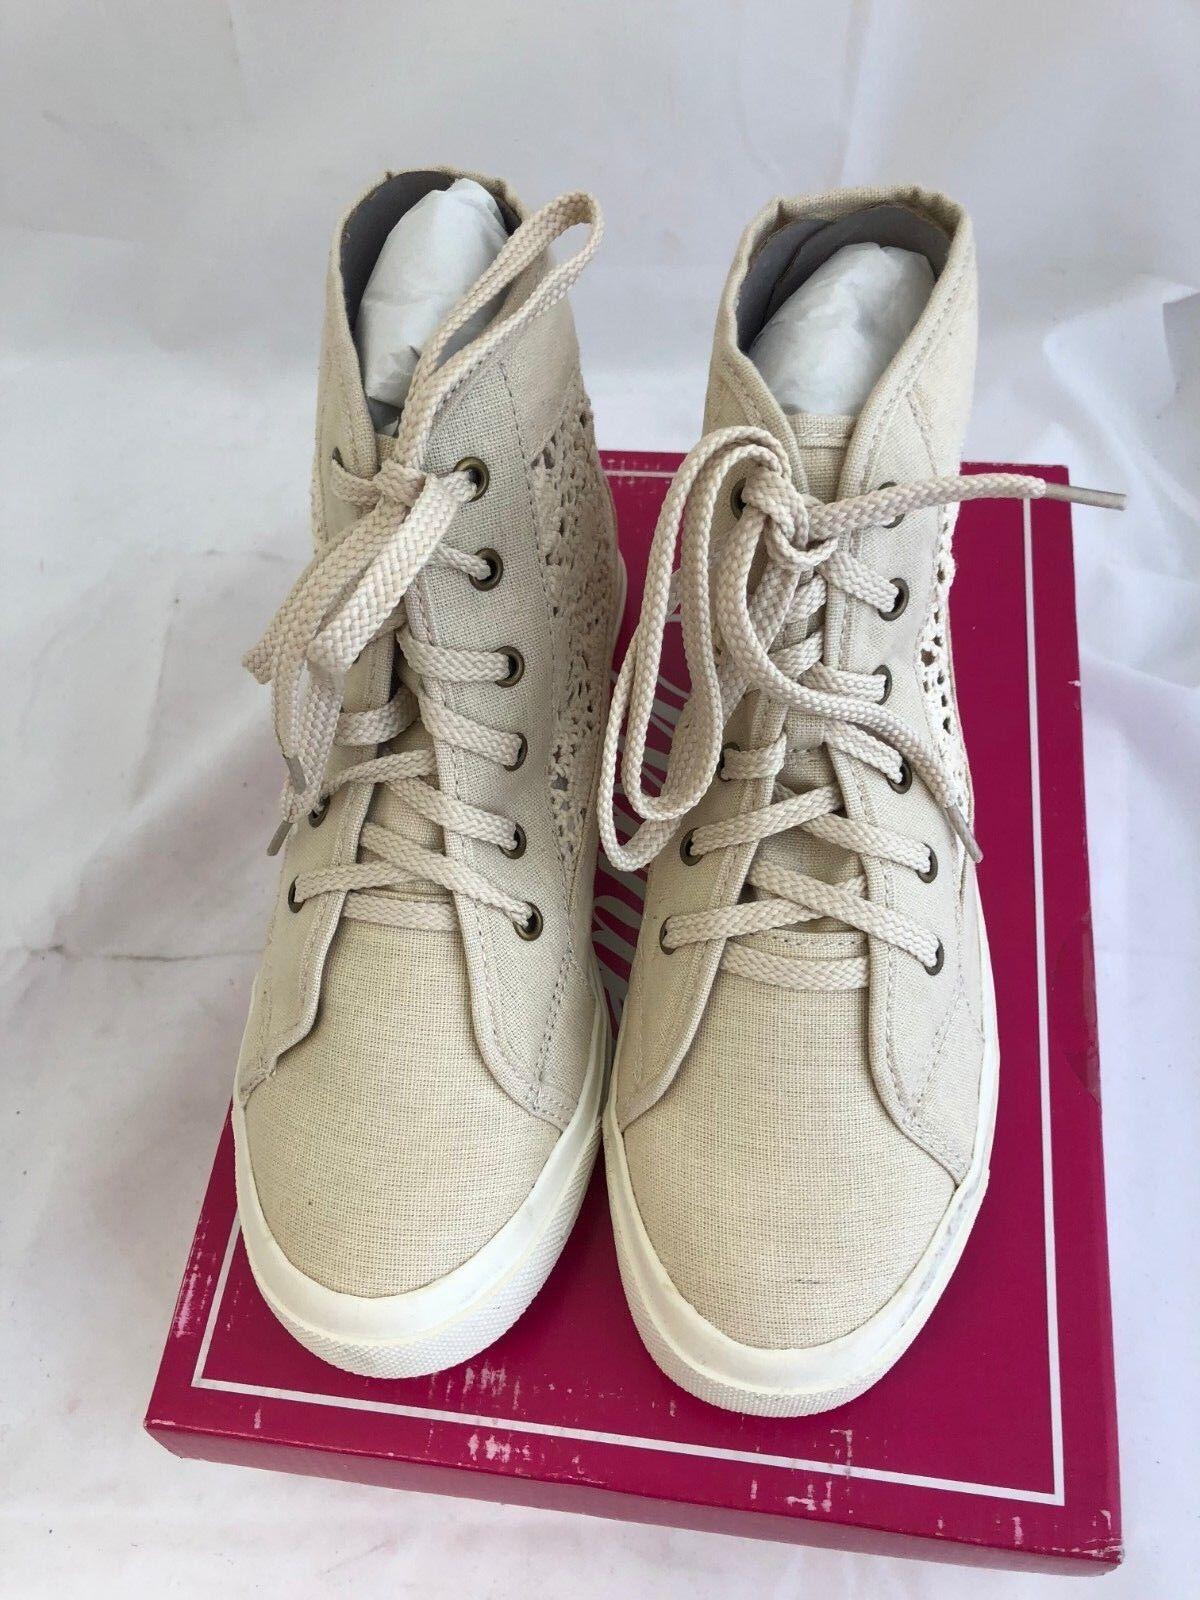 d261be6e Quería Zapatos tenis de moda para mujer mujer mujer Lincoln natural 7 M US  219ad3 ...